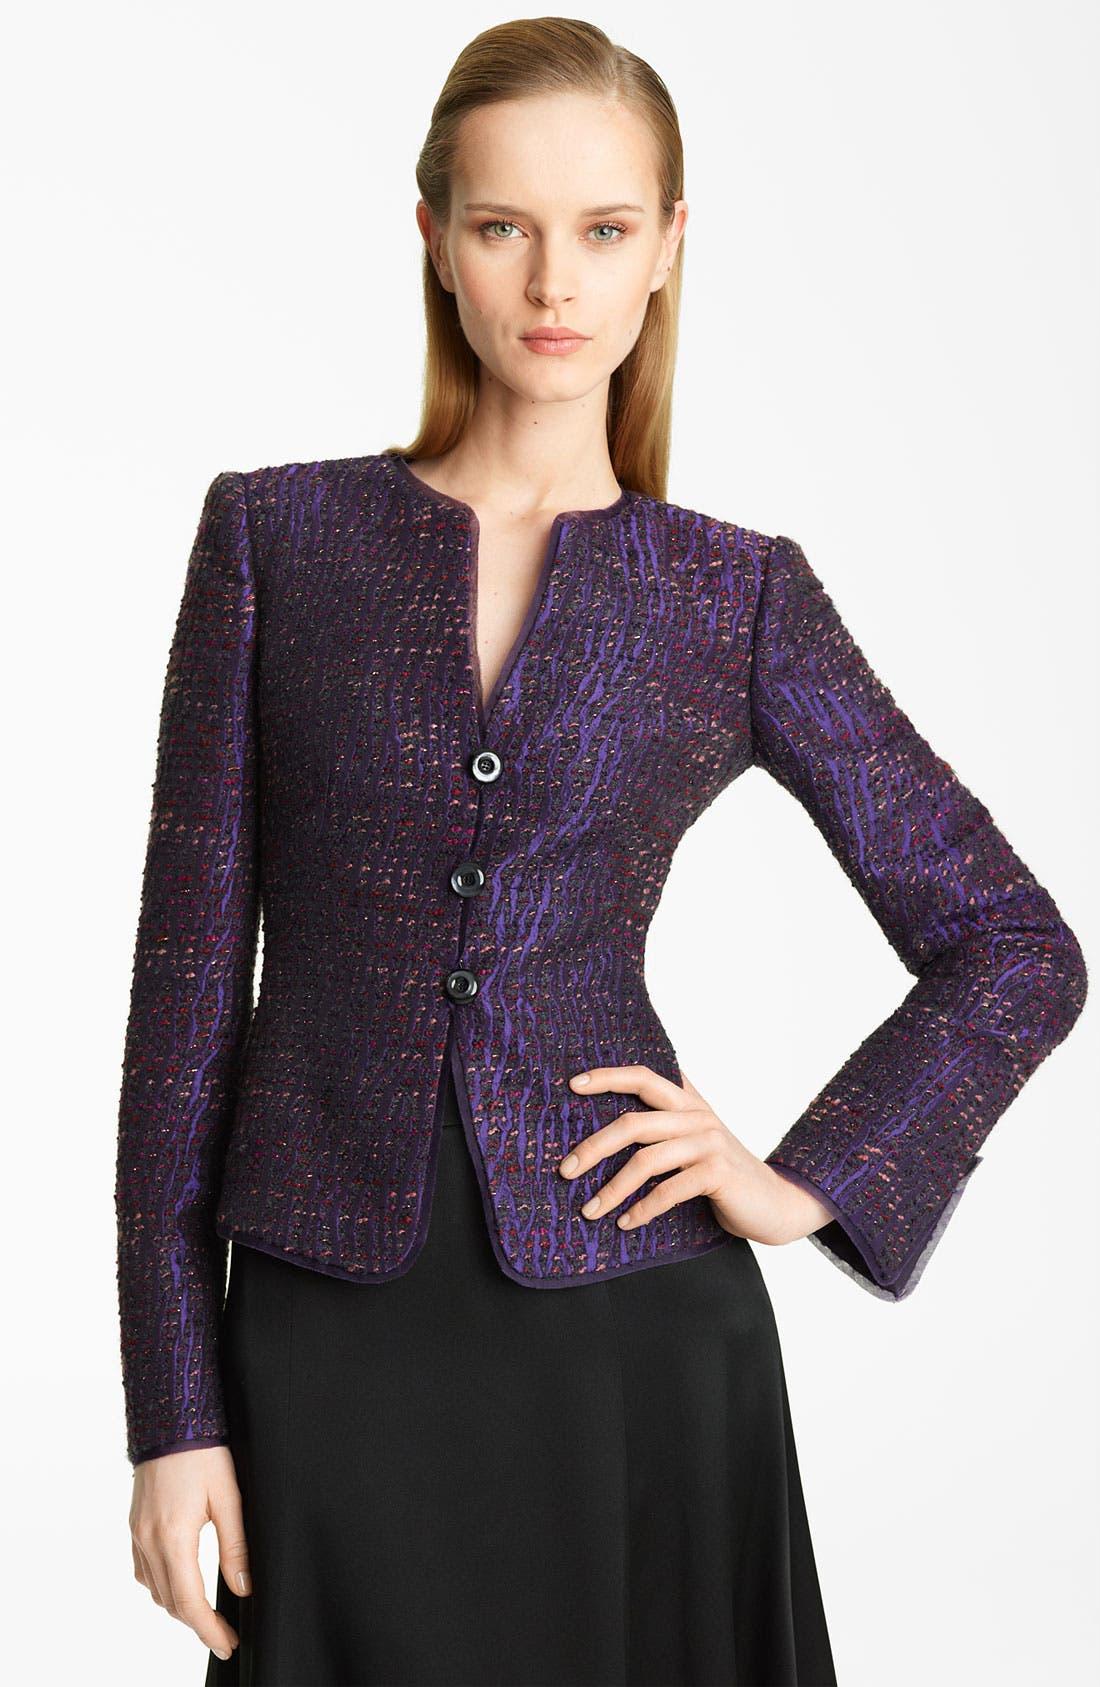 Alternate Image 1 Selected - Armani Collezioni Lamé Textured Tweed Jacket